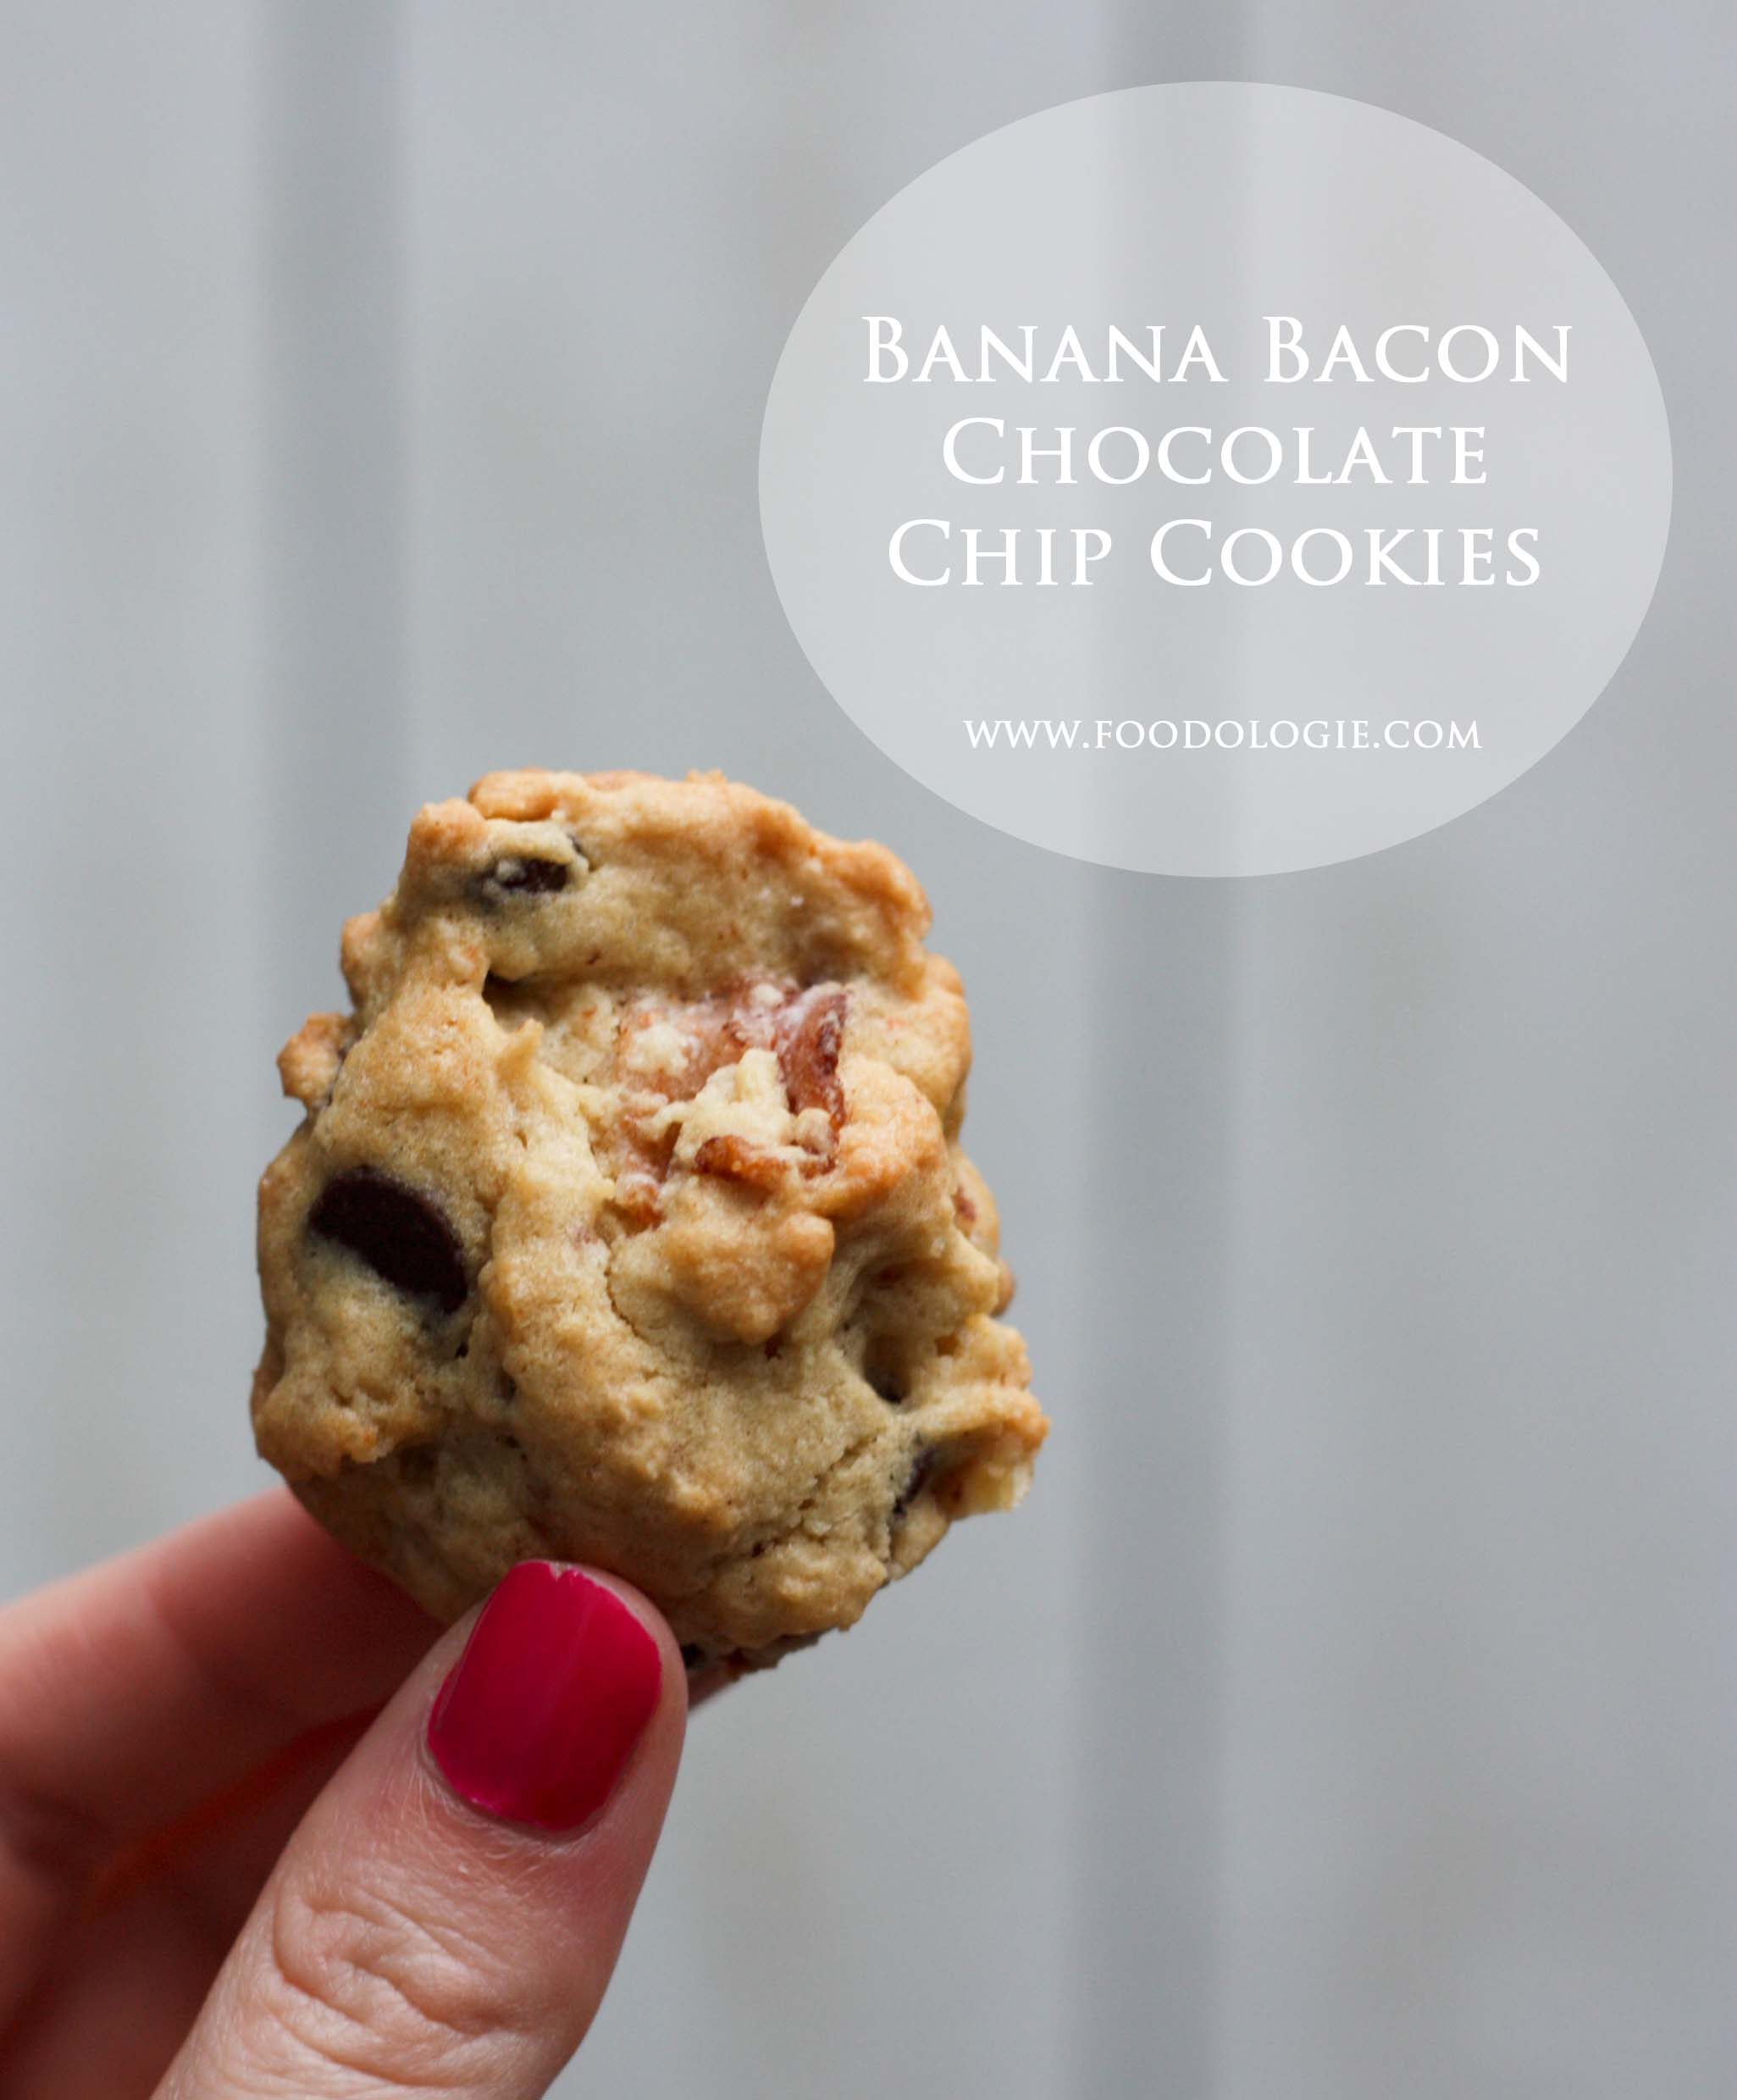 Banana Bacon Chocolate Chip Cookies – Foodologie